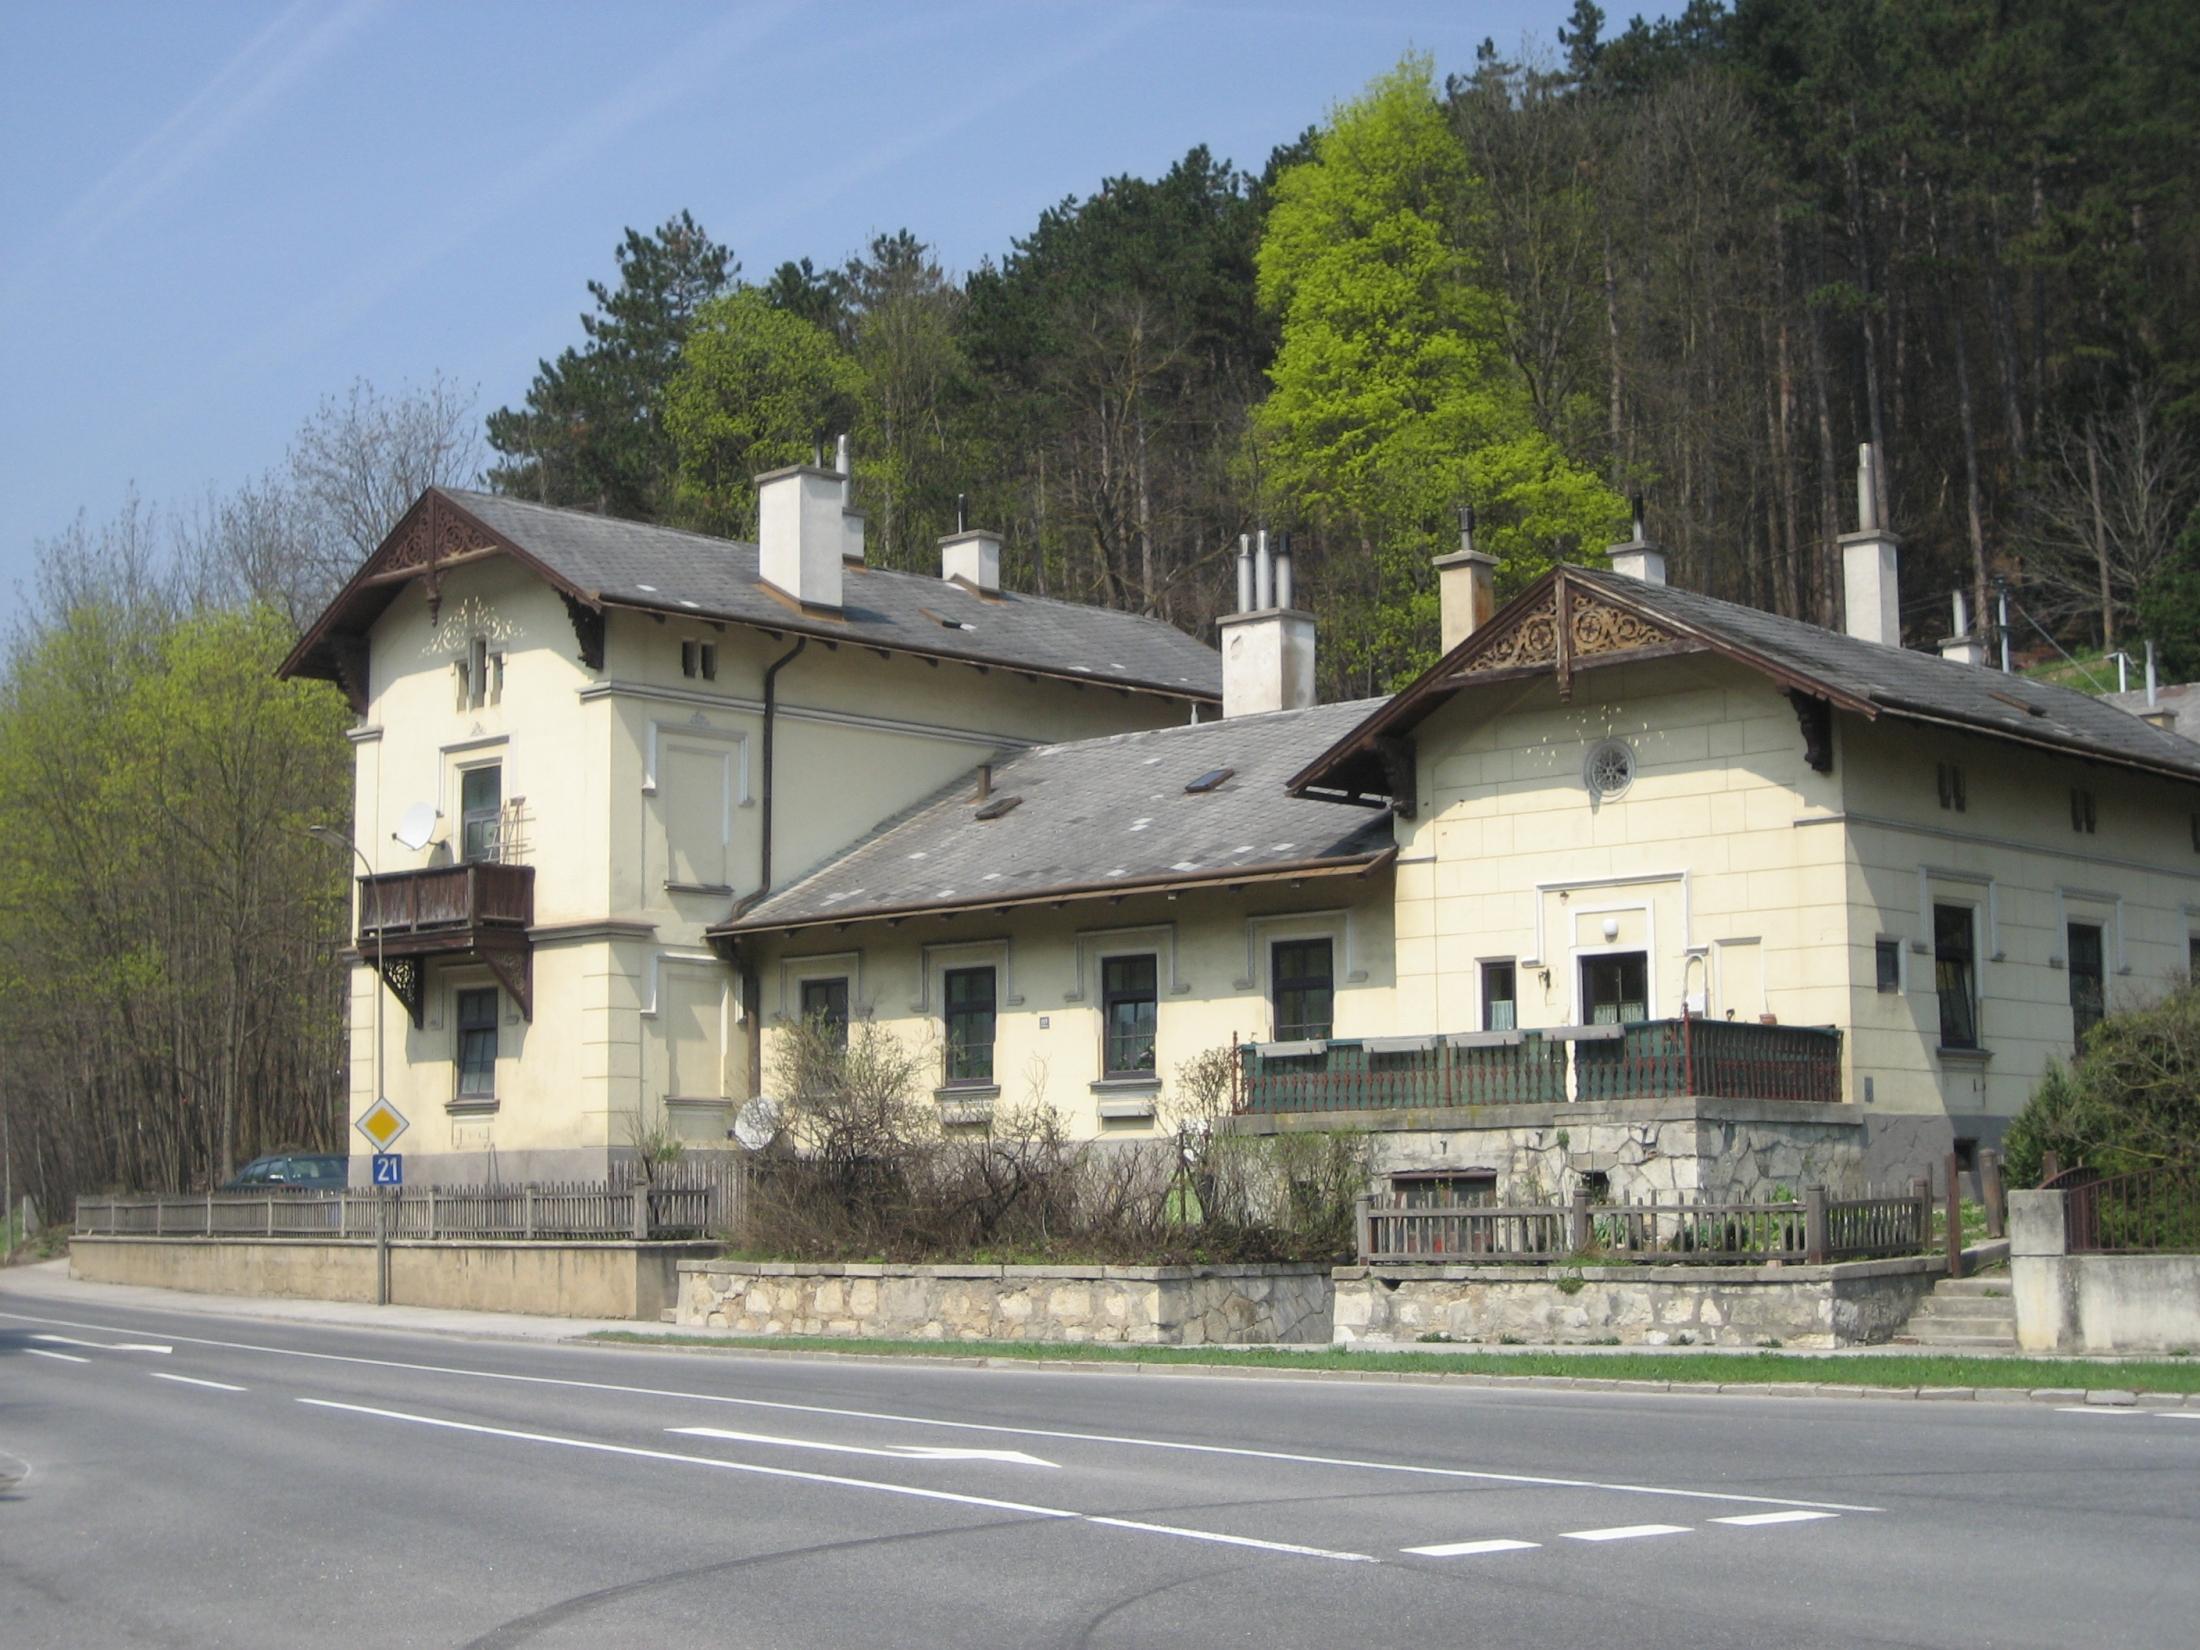 NNMS Markt Piesting - Waldegg - RiS-Kommunal - Startseite